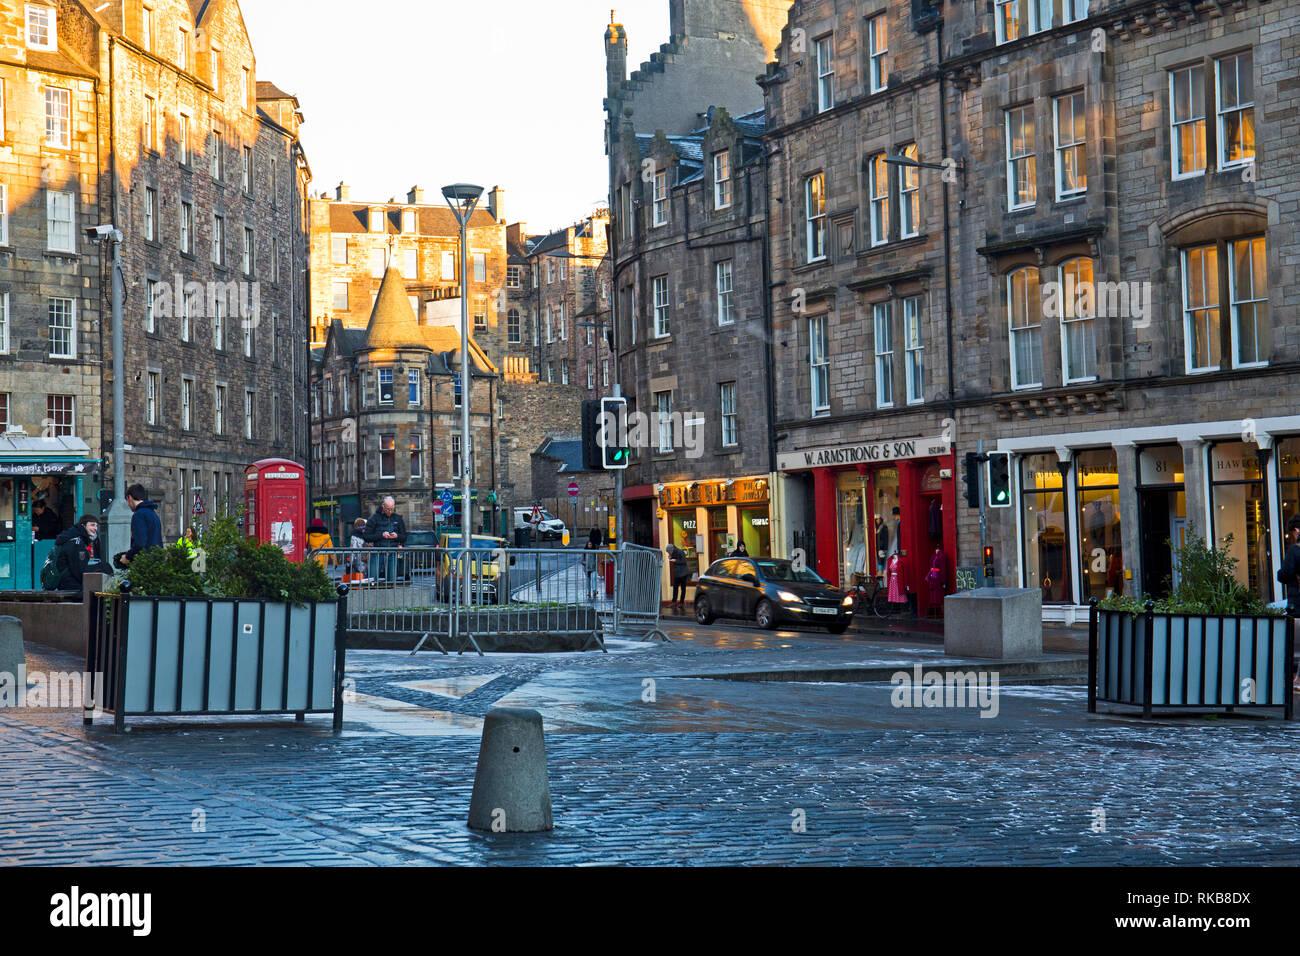 The Grassmarket, Edinburgh, Scotland - Stock Image